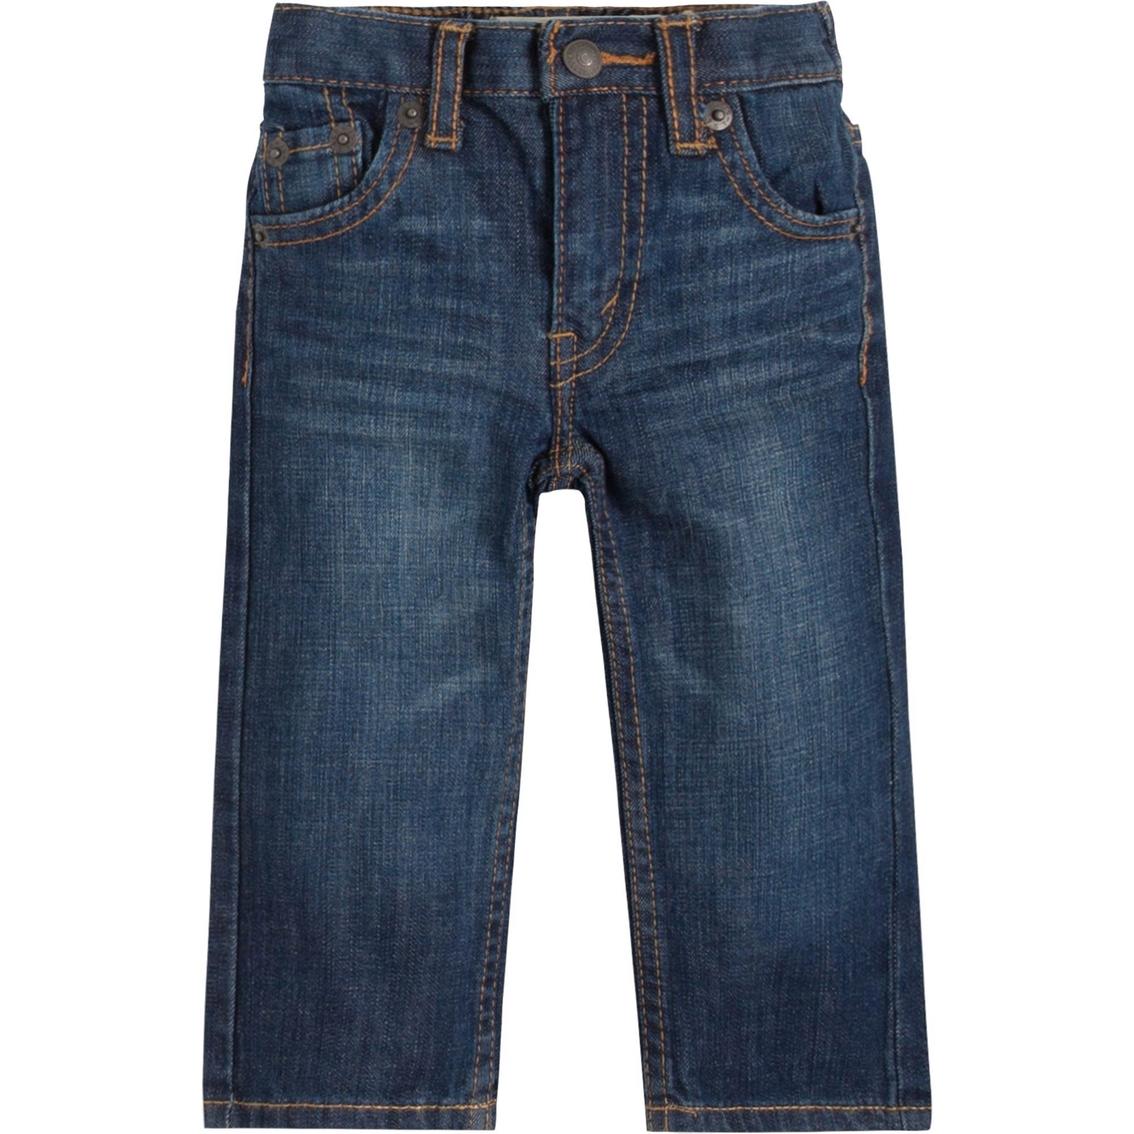 Leviu0026#39;s Infant Boys 526 Regular Fit Denim Blue Jeans | Baby Boy 0-24 Months | Apparel | Shop The ...